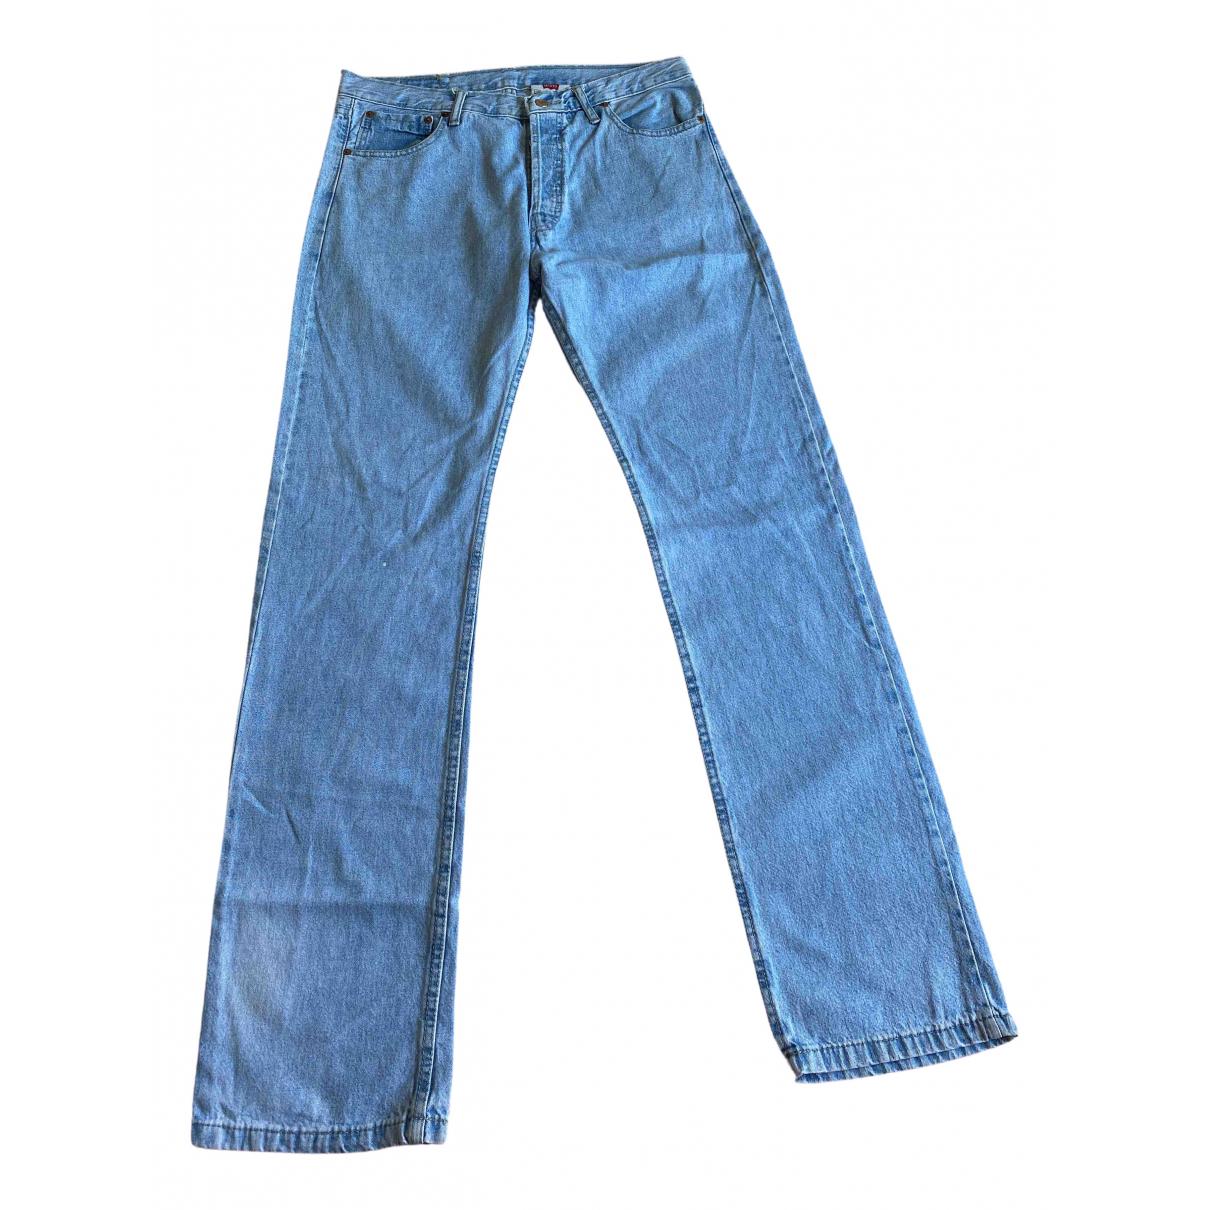 Levi's Vintage Clothing \N Blue Denim - Jeans Jeans for Women 33 US